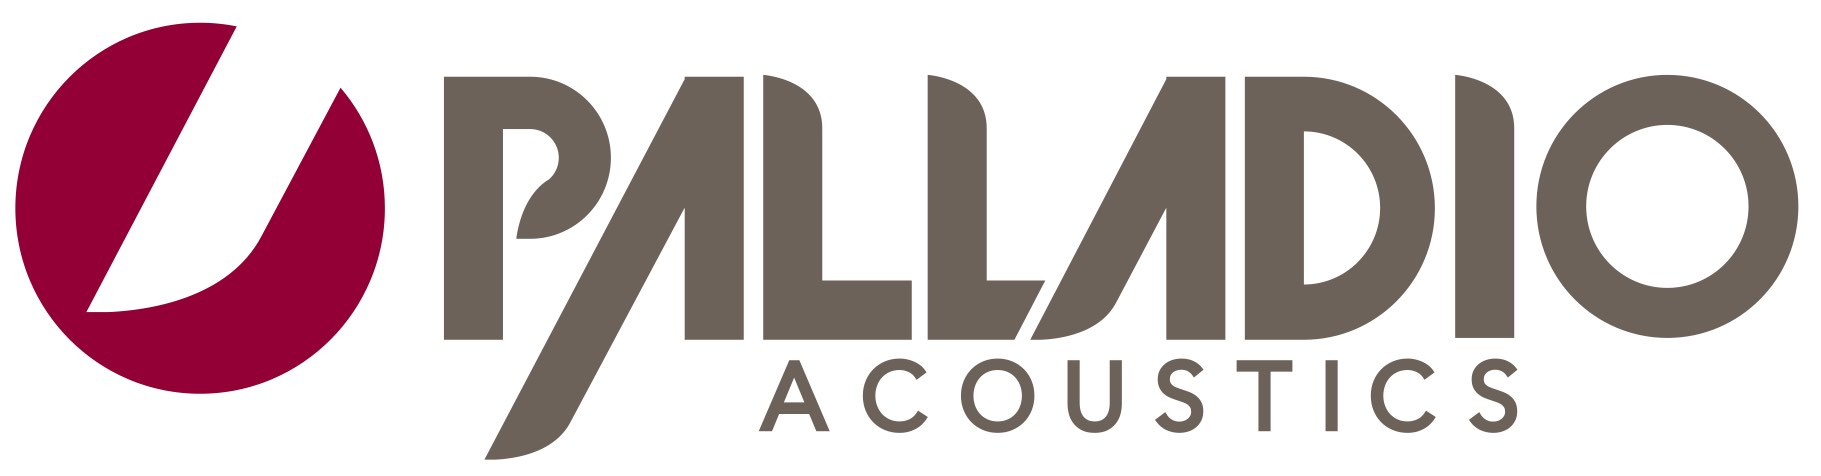 Palladio acoustics